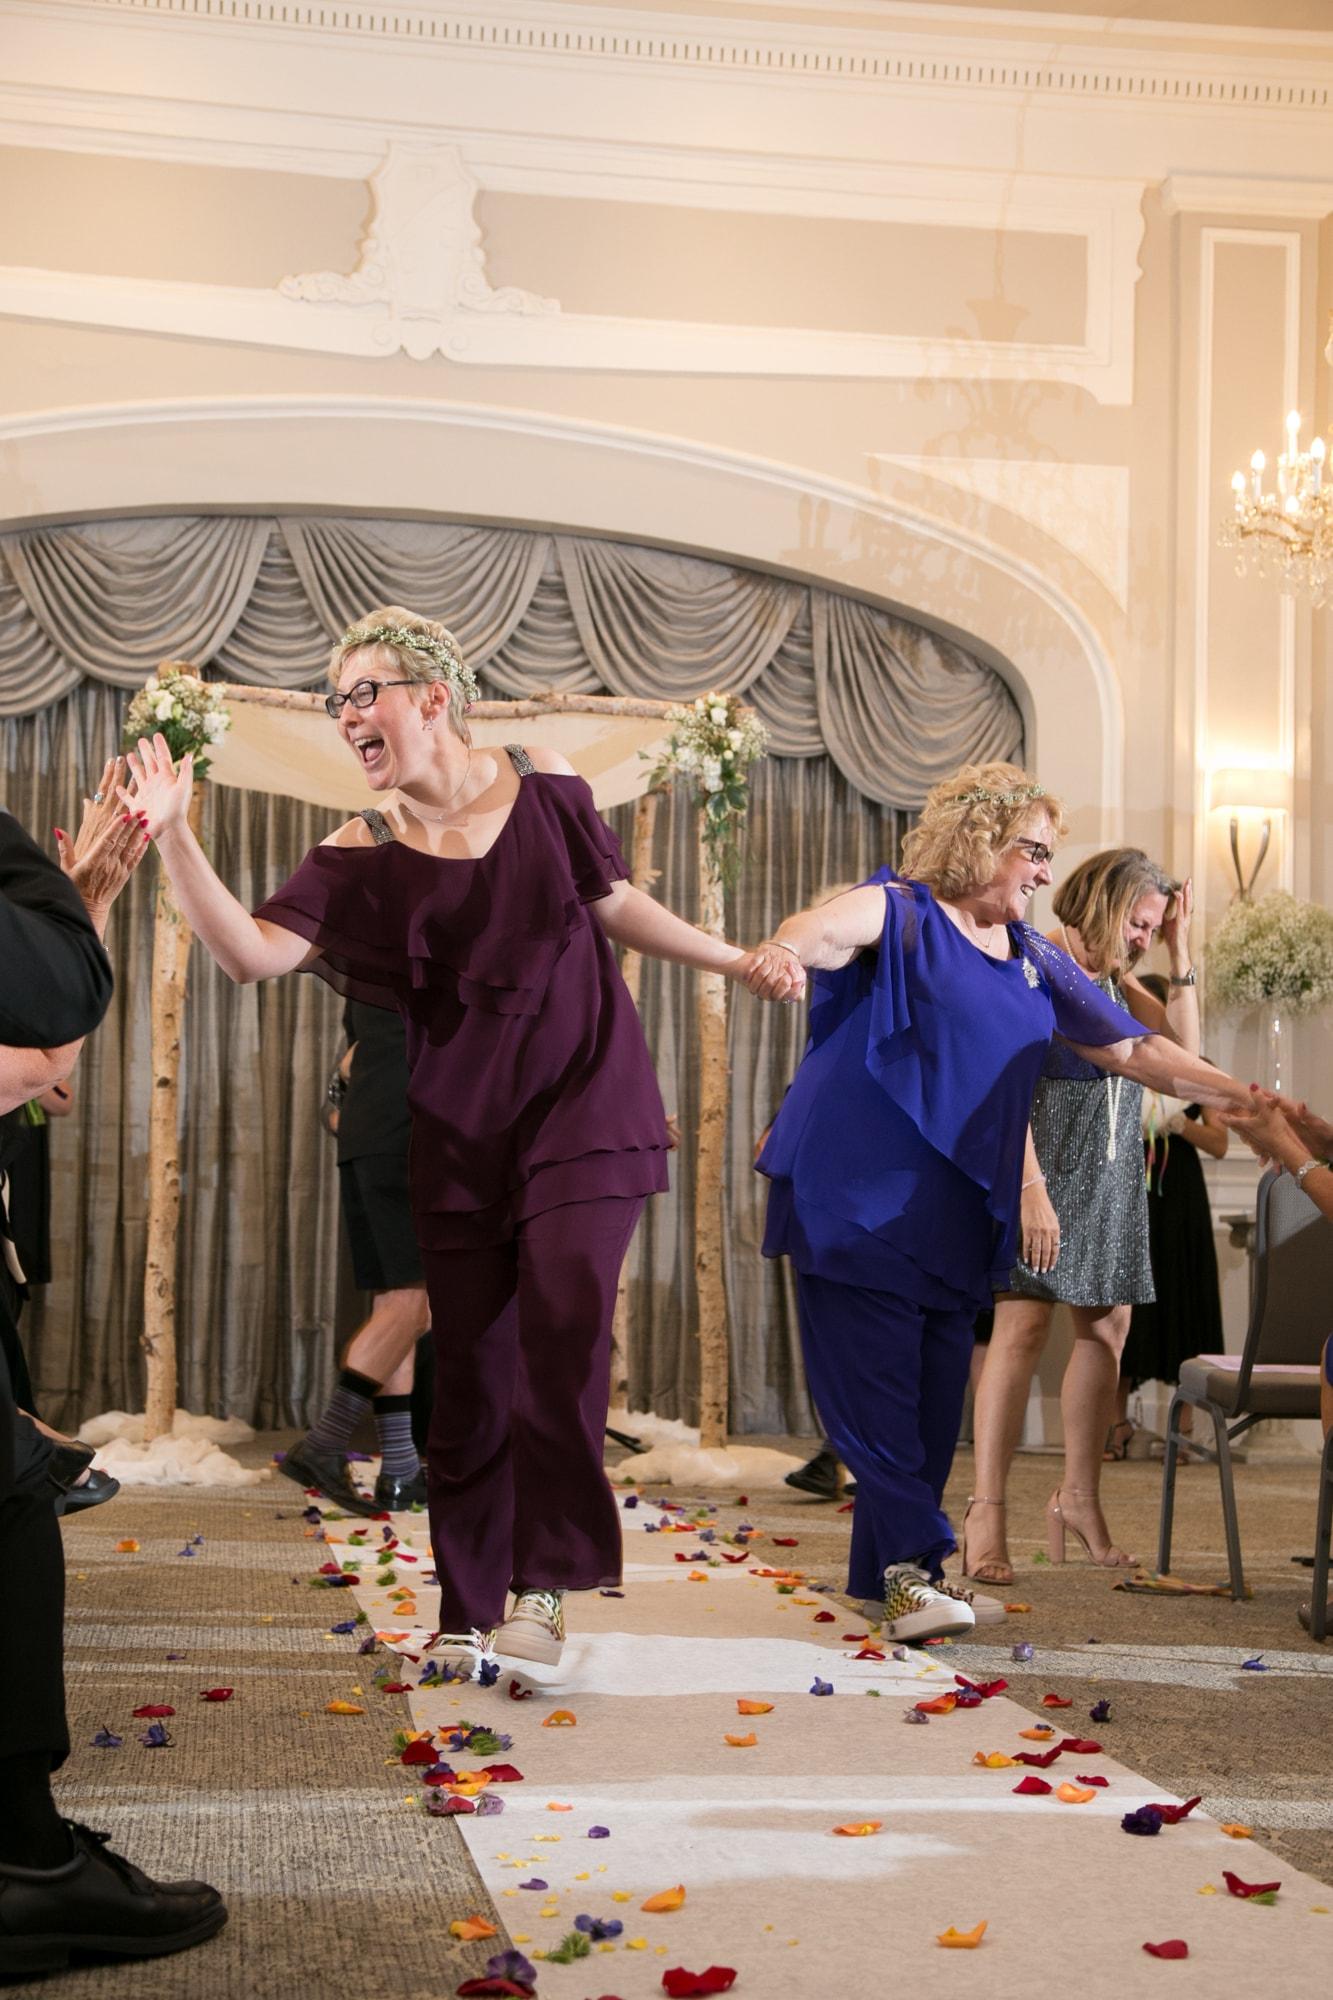 Happy brides dancing after the wedding ceremony